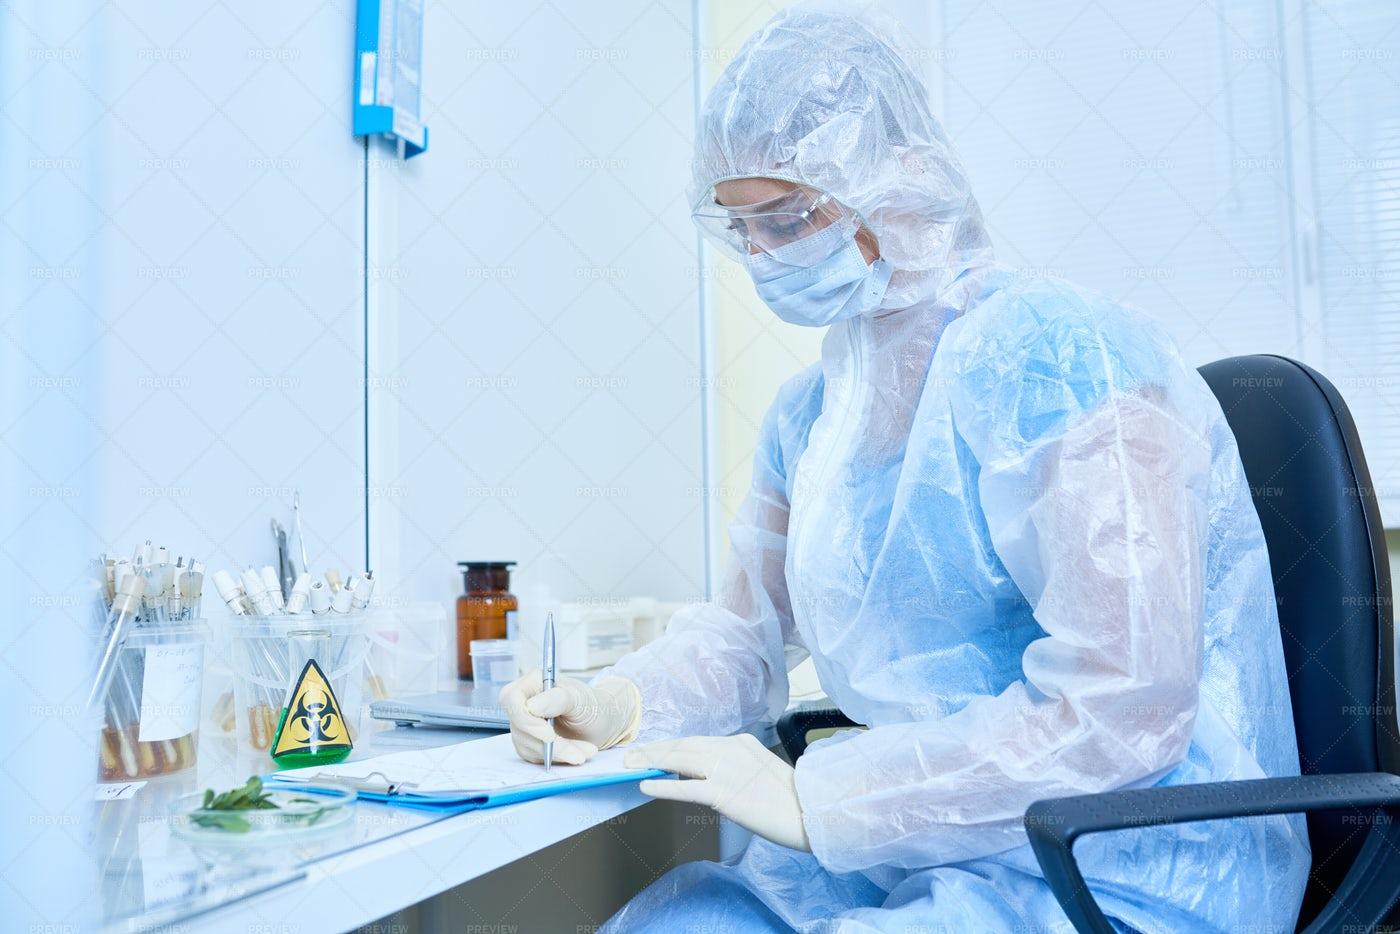 Scientist Researching Virus: Stock Photos